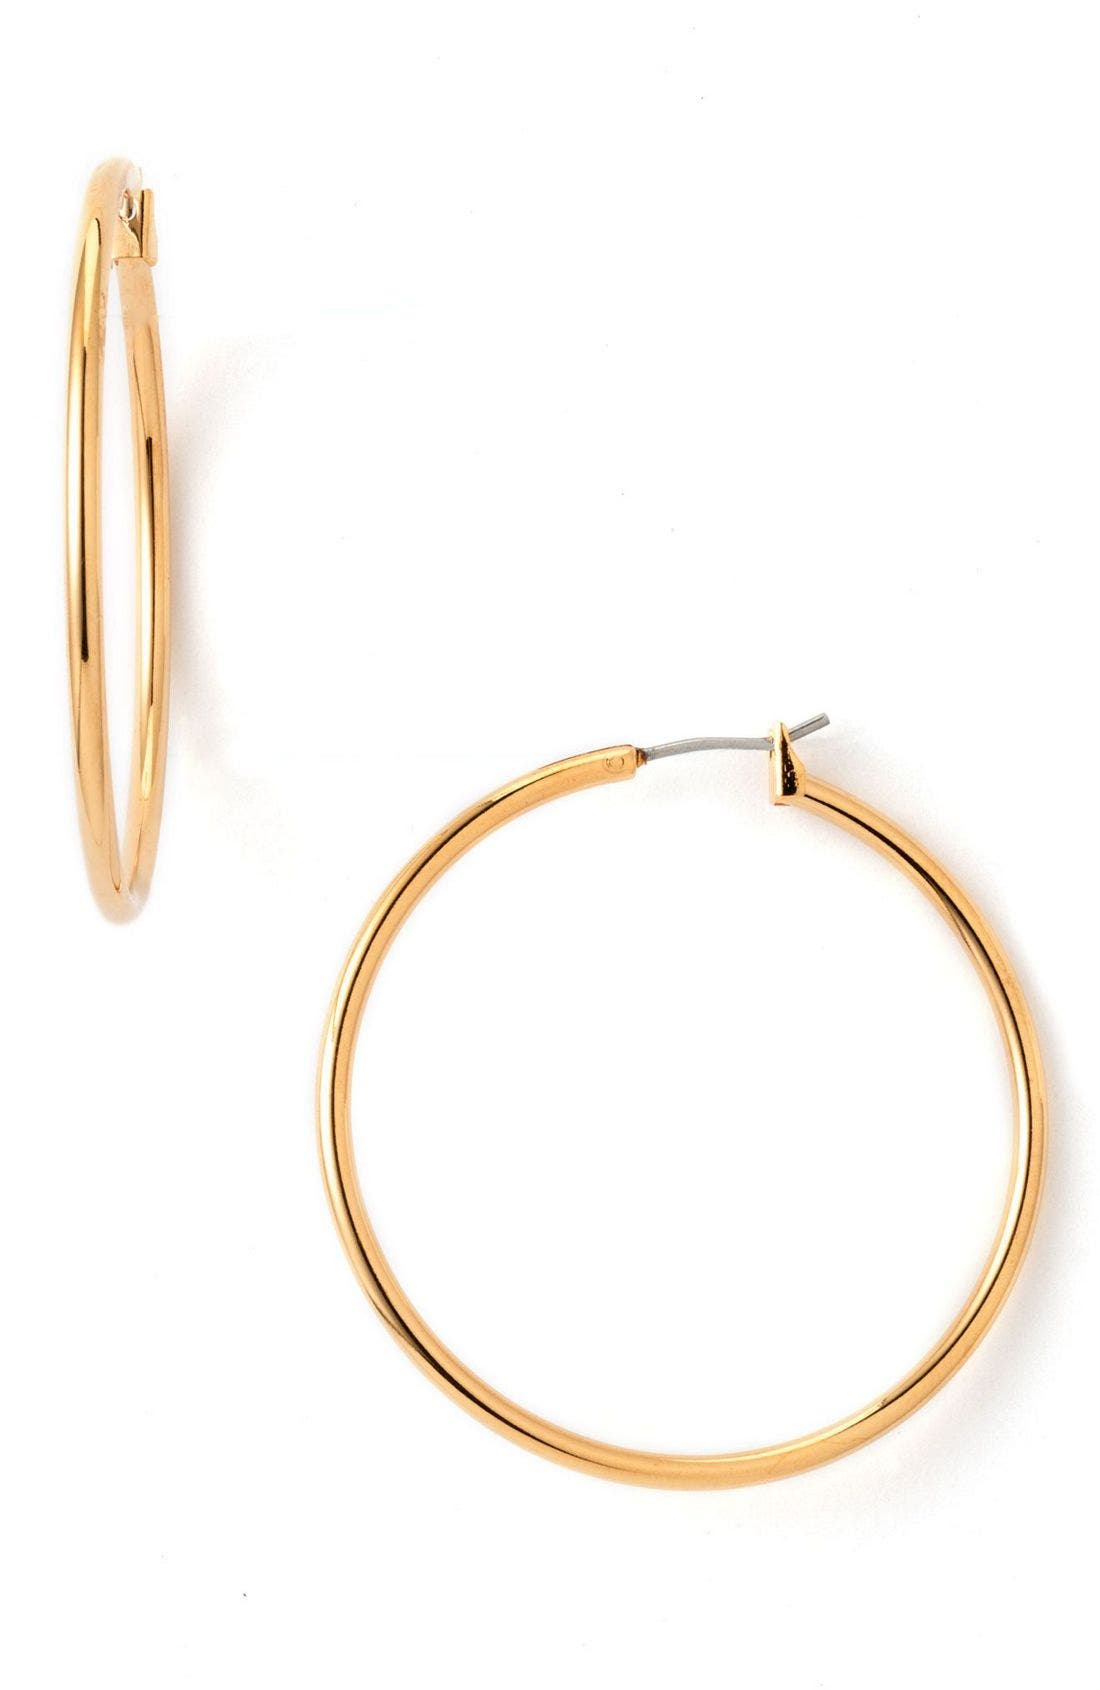 Nordstrom Classic Hoop Earrings Nordstrom Exclusive